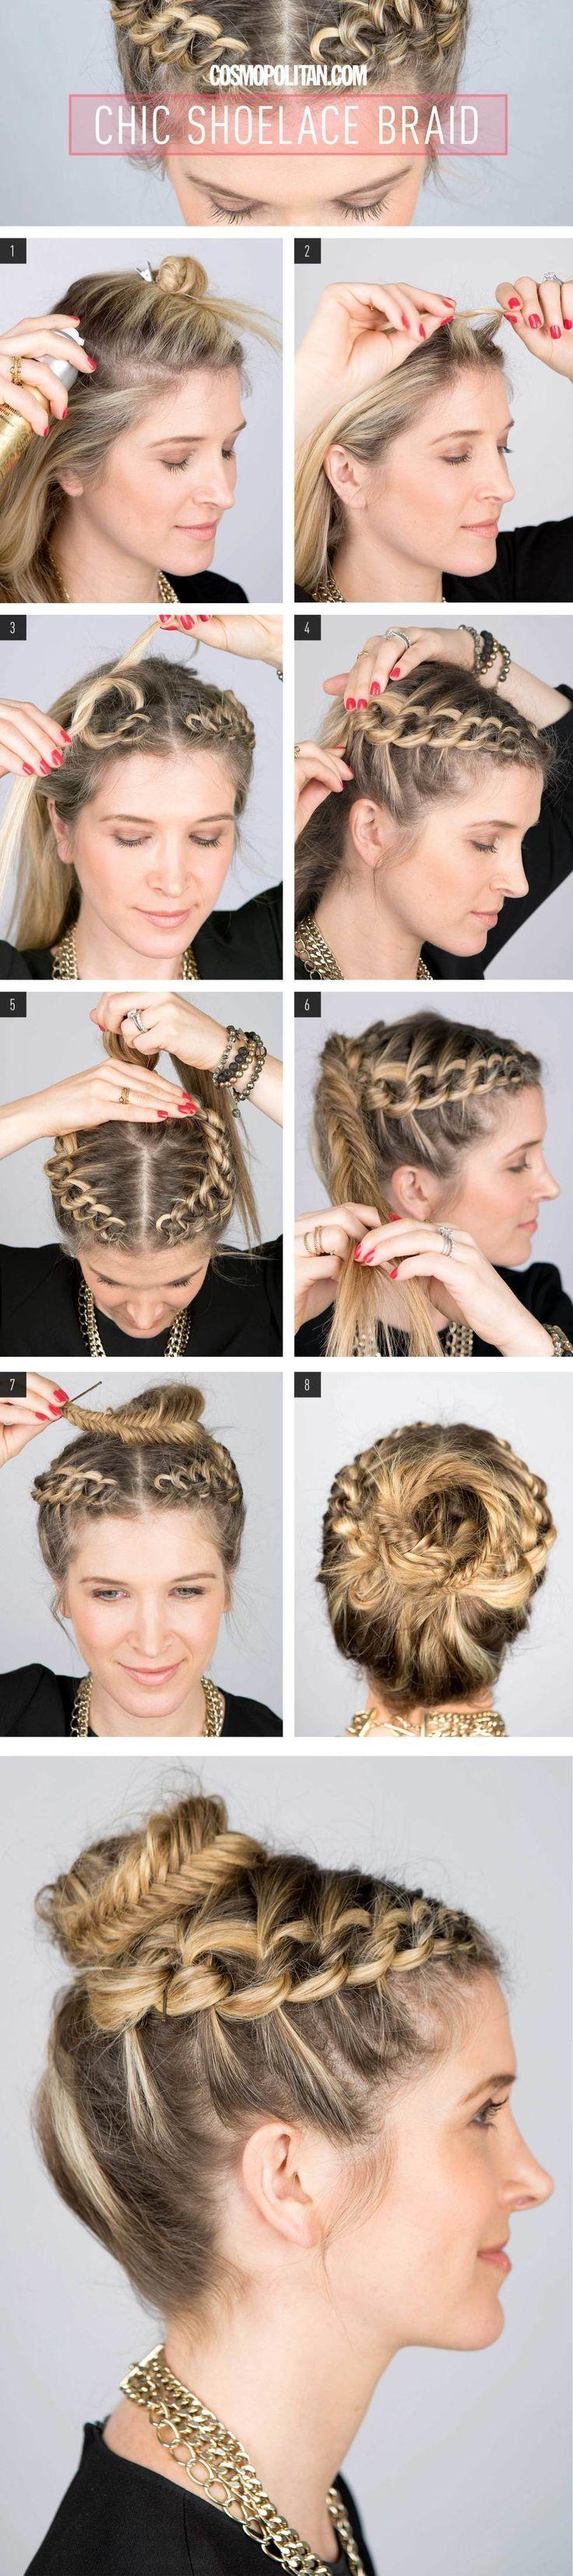 Super cute braid idea